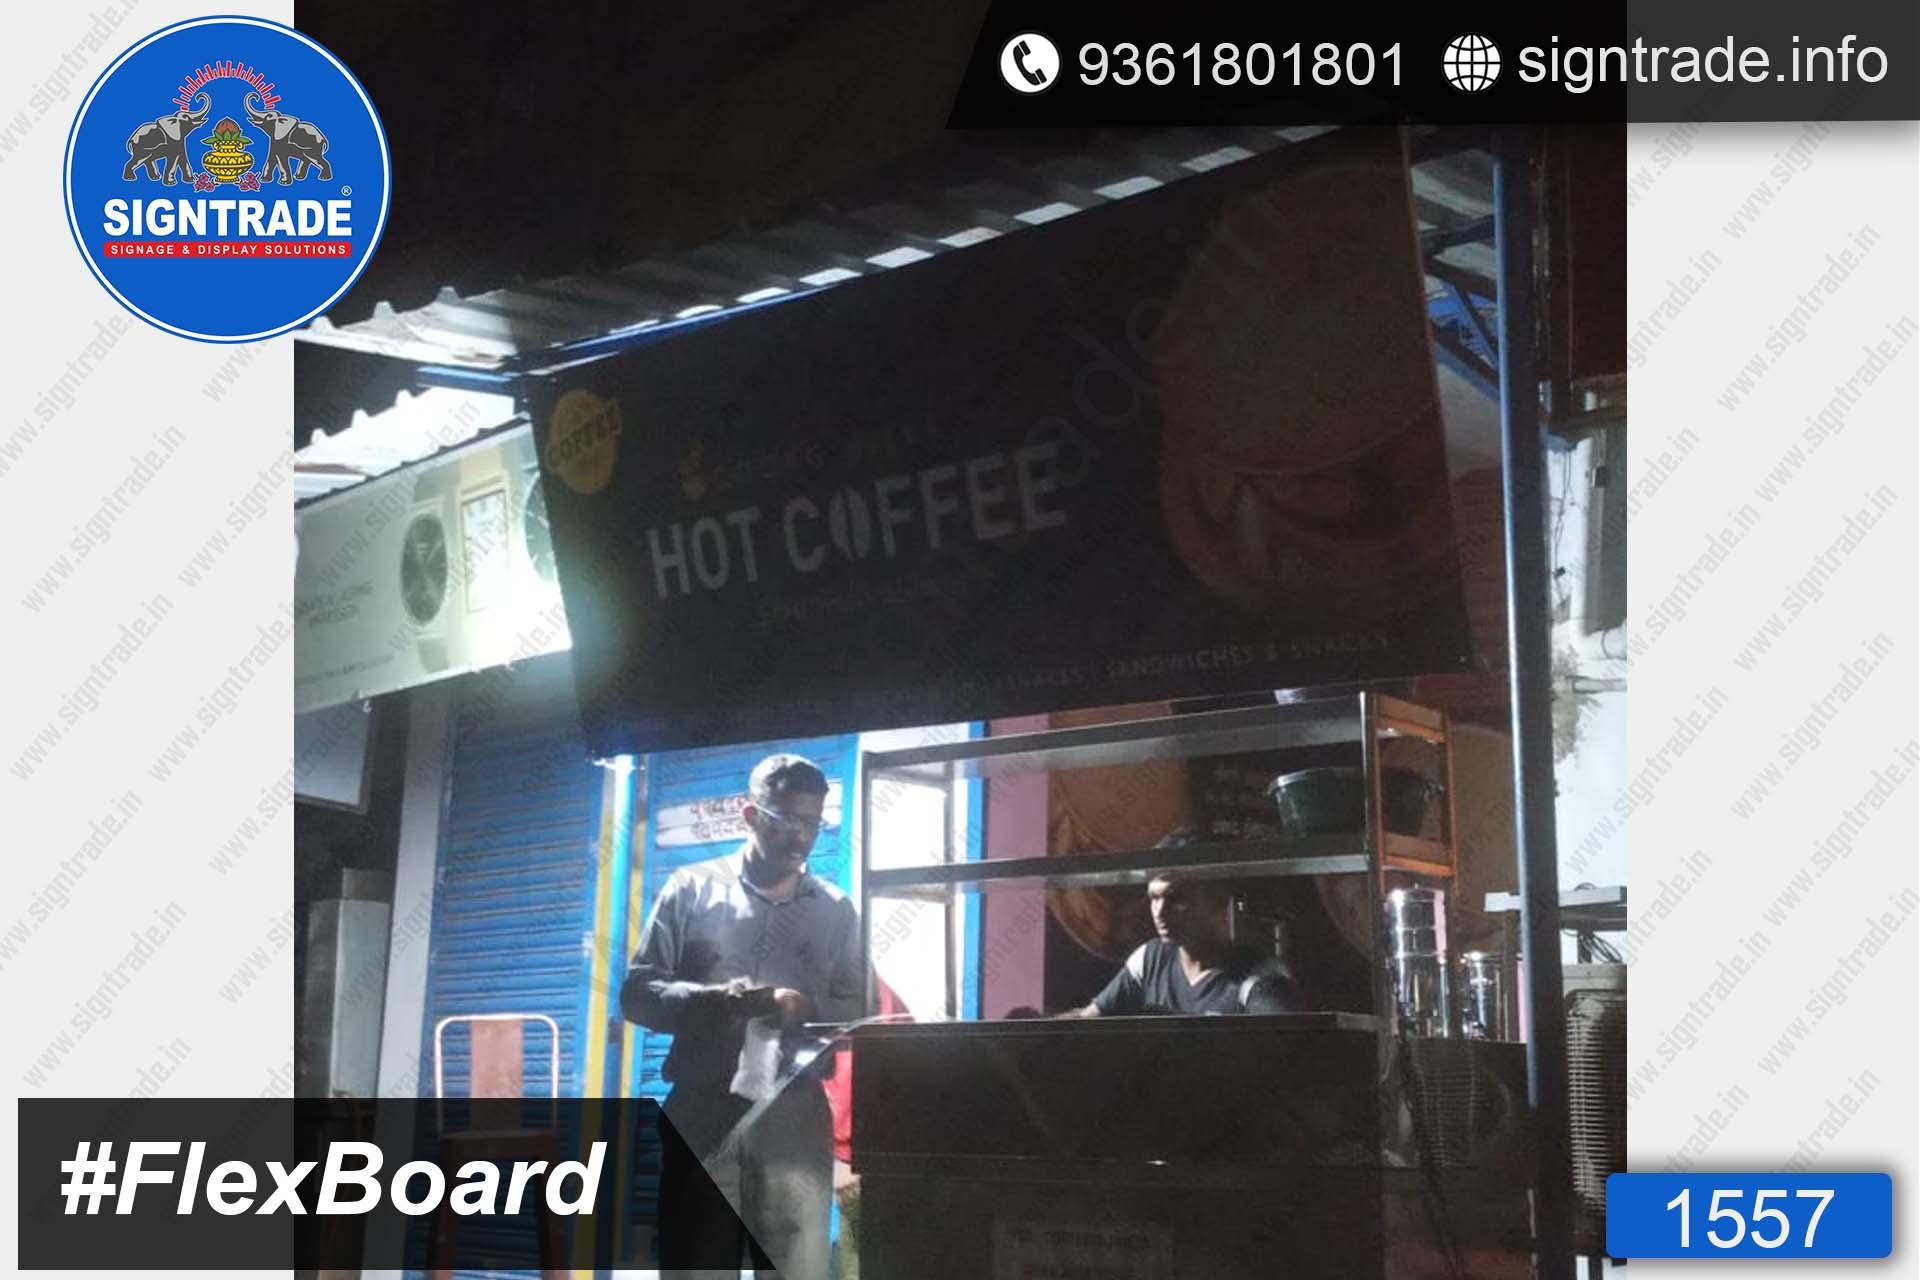 Hot Coffee, Pattabiram, Chennai - SIGNTRADE - Digital Flex Printing Service - Frontlit Flex Board Manufacturers in Chennai